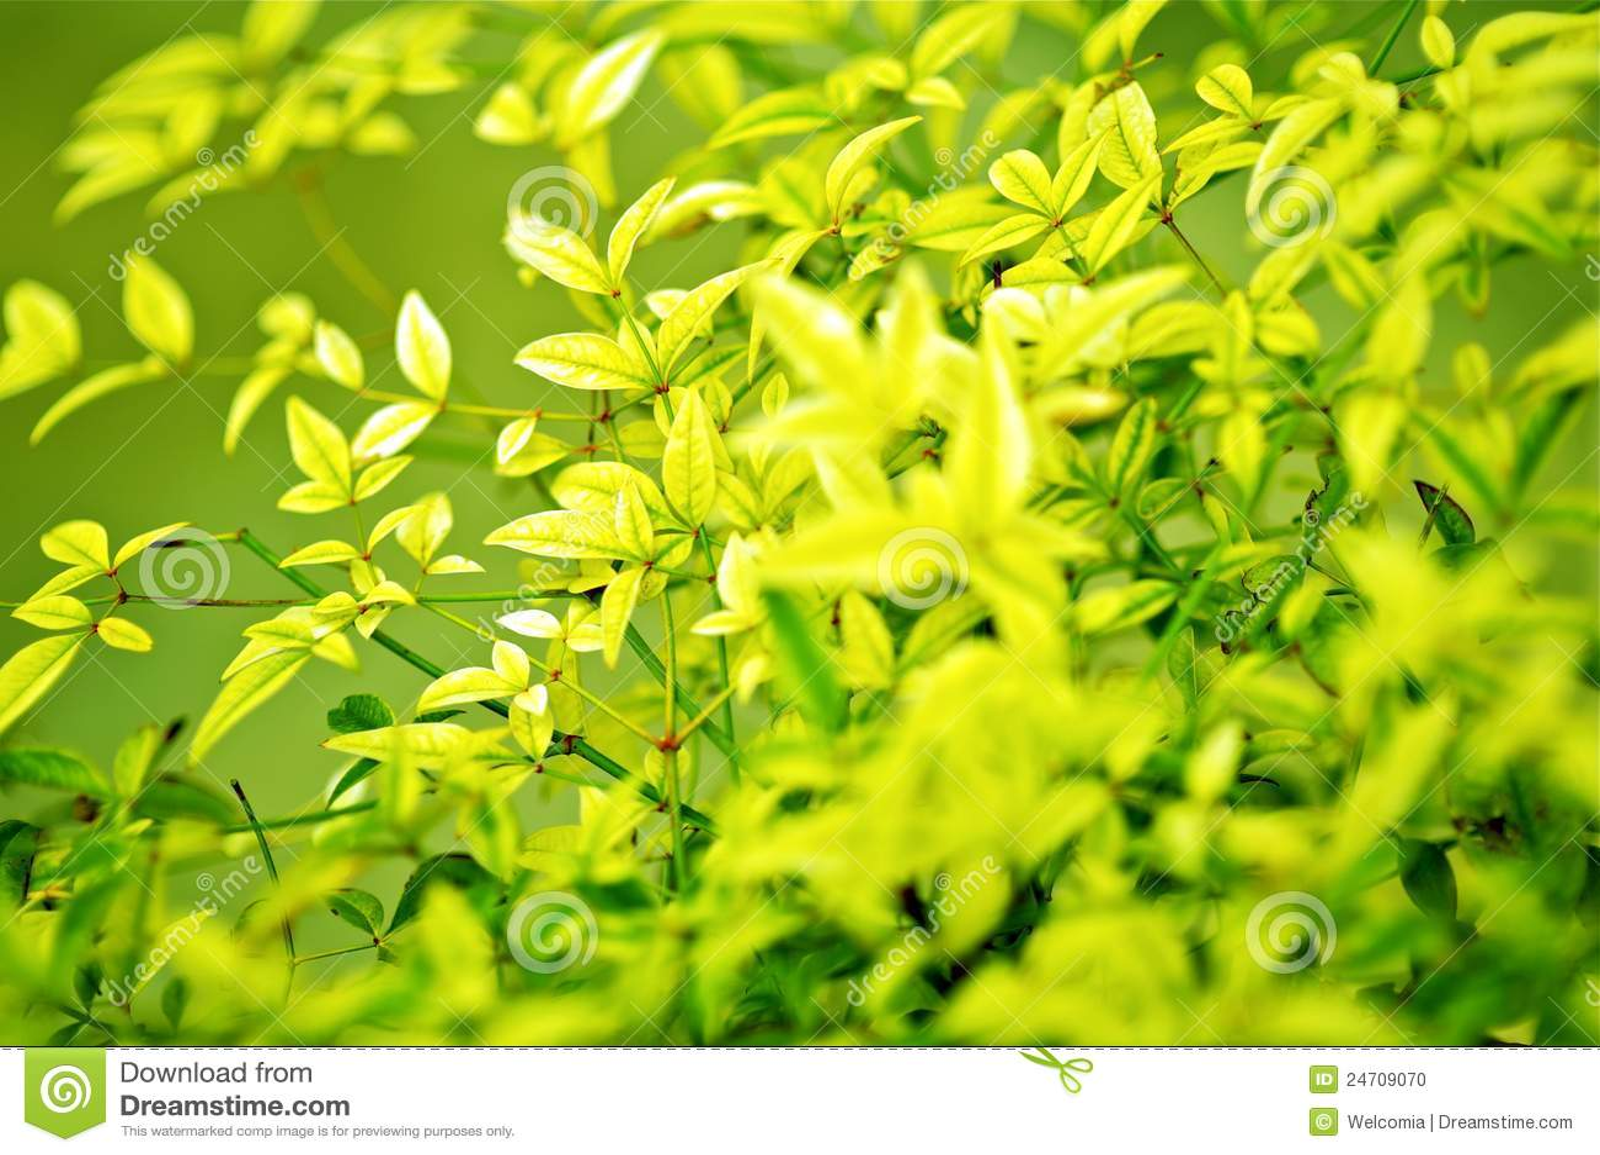 Leafes предпосылки зеленые